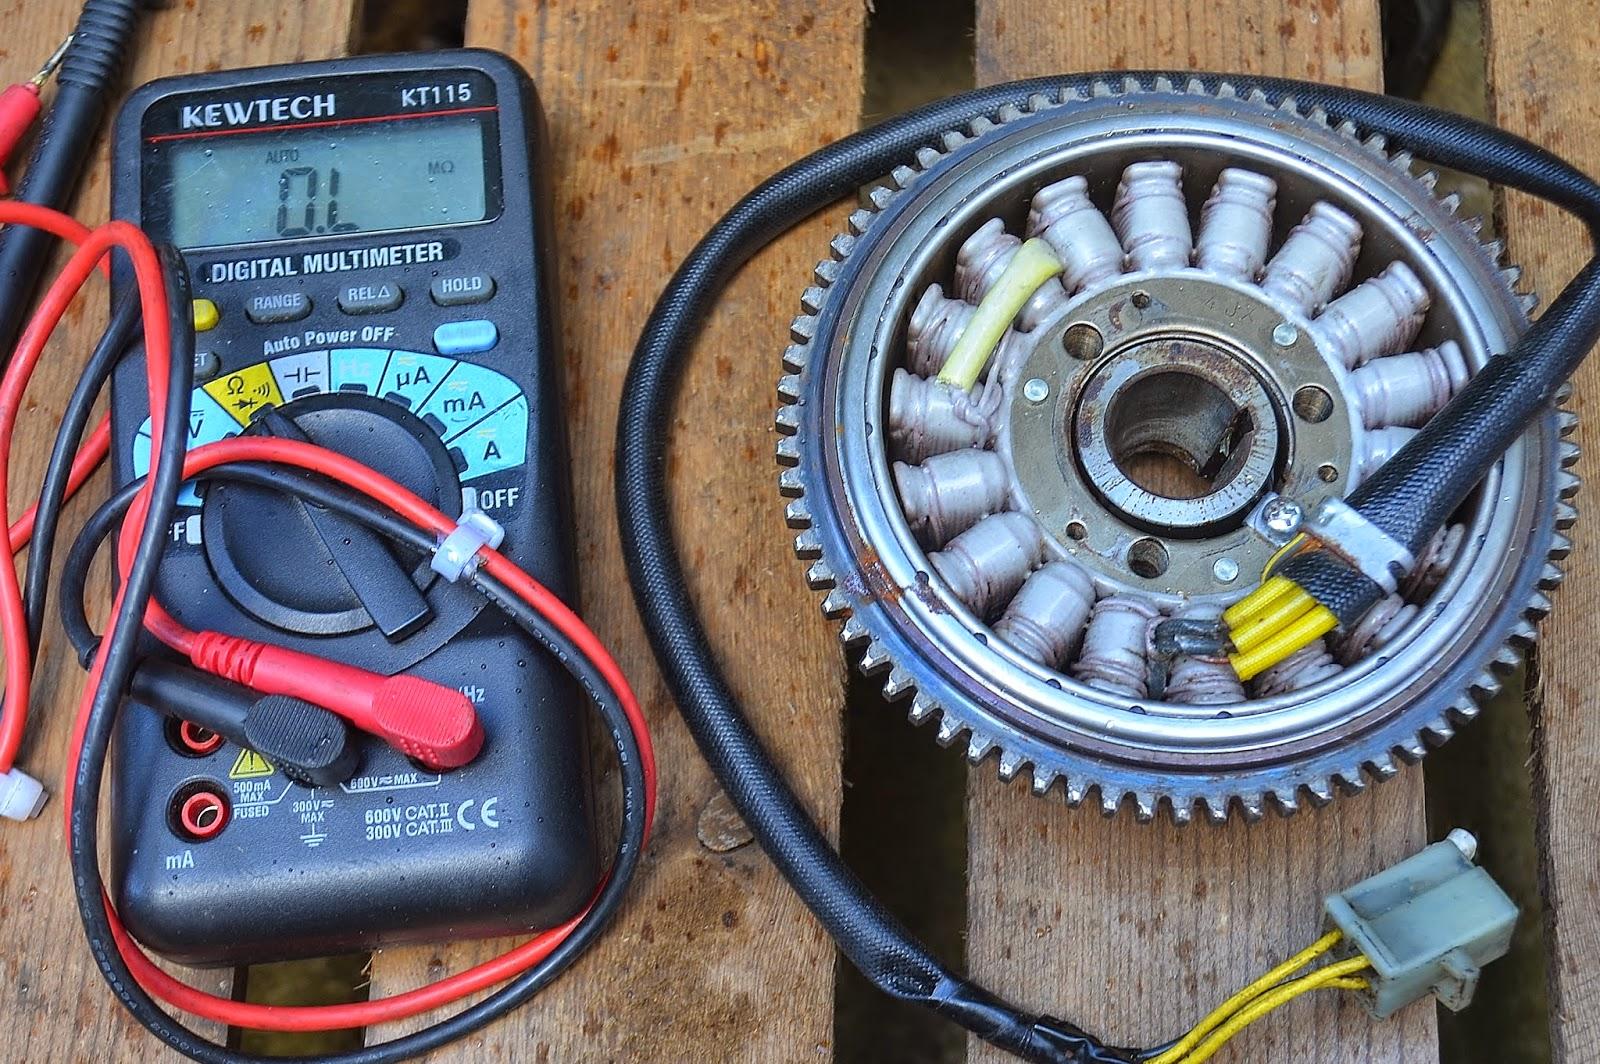 ford alternator diode testing advance t8 ballast wiring diagram aprilia rs 125 charging generator